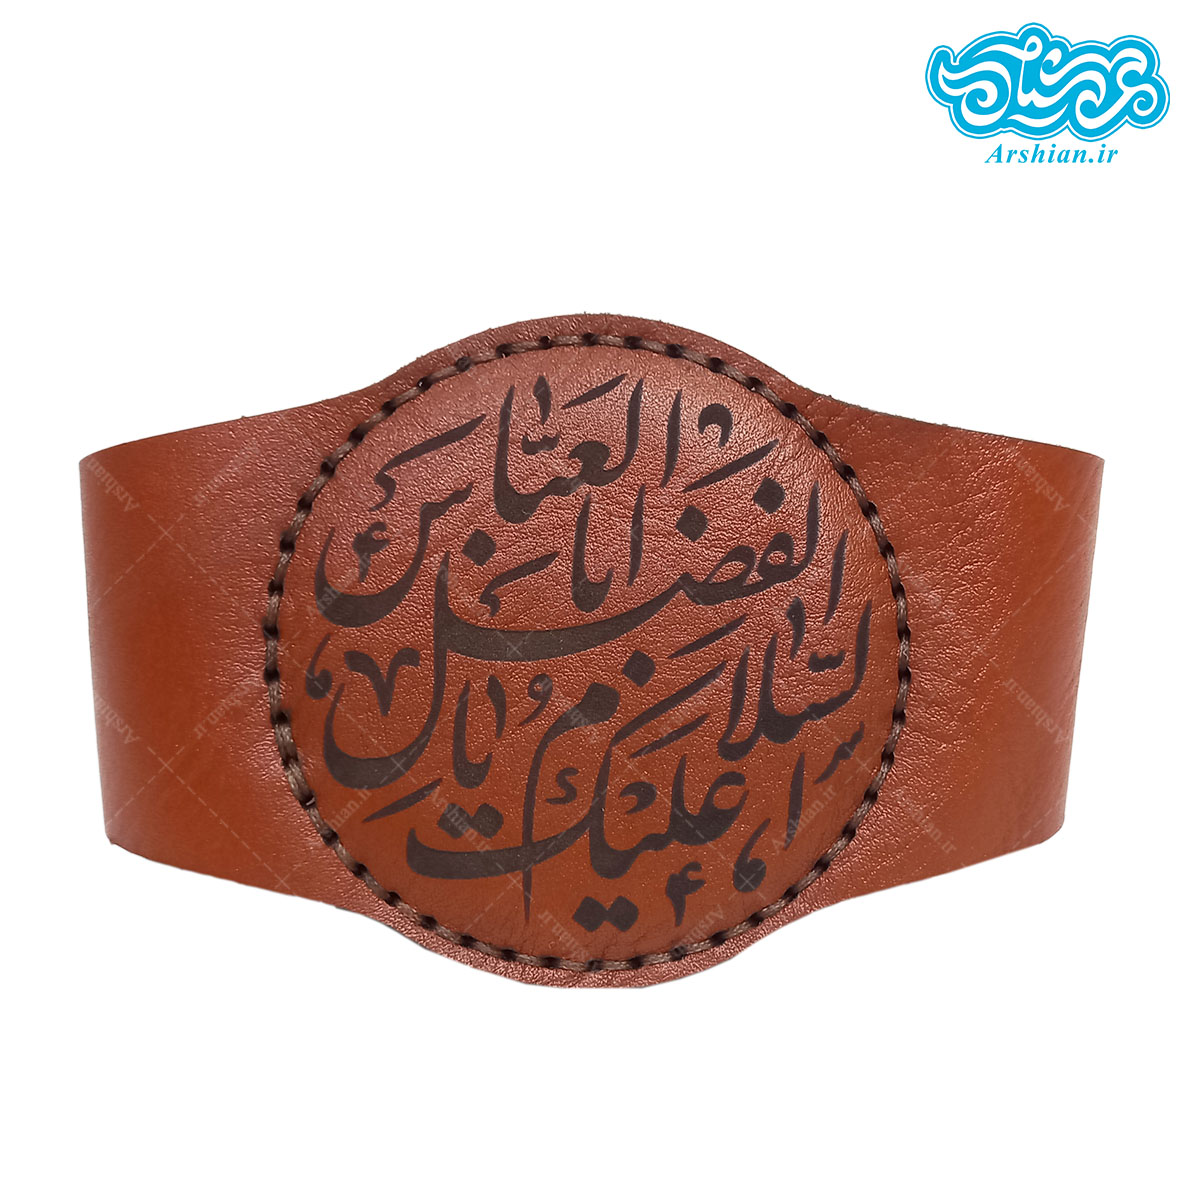 بازوبند چرم طرح السلام علیک یاابالفضل العباس کد004